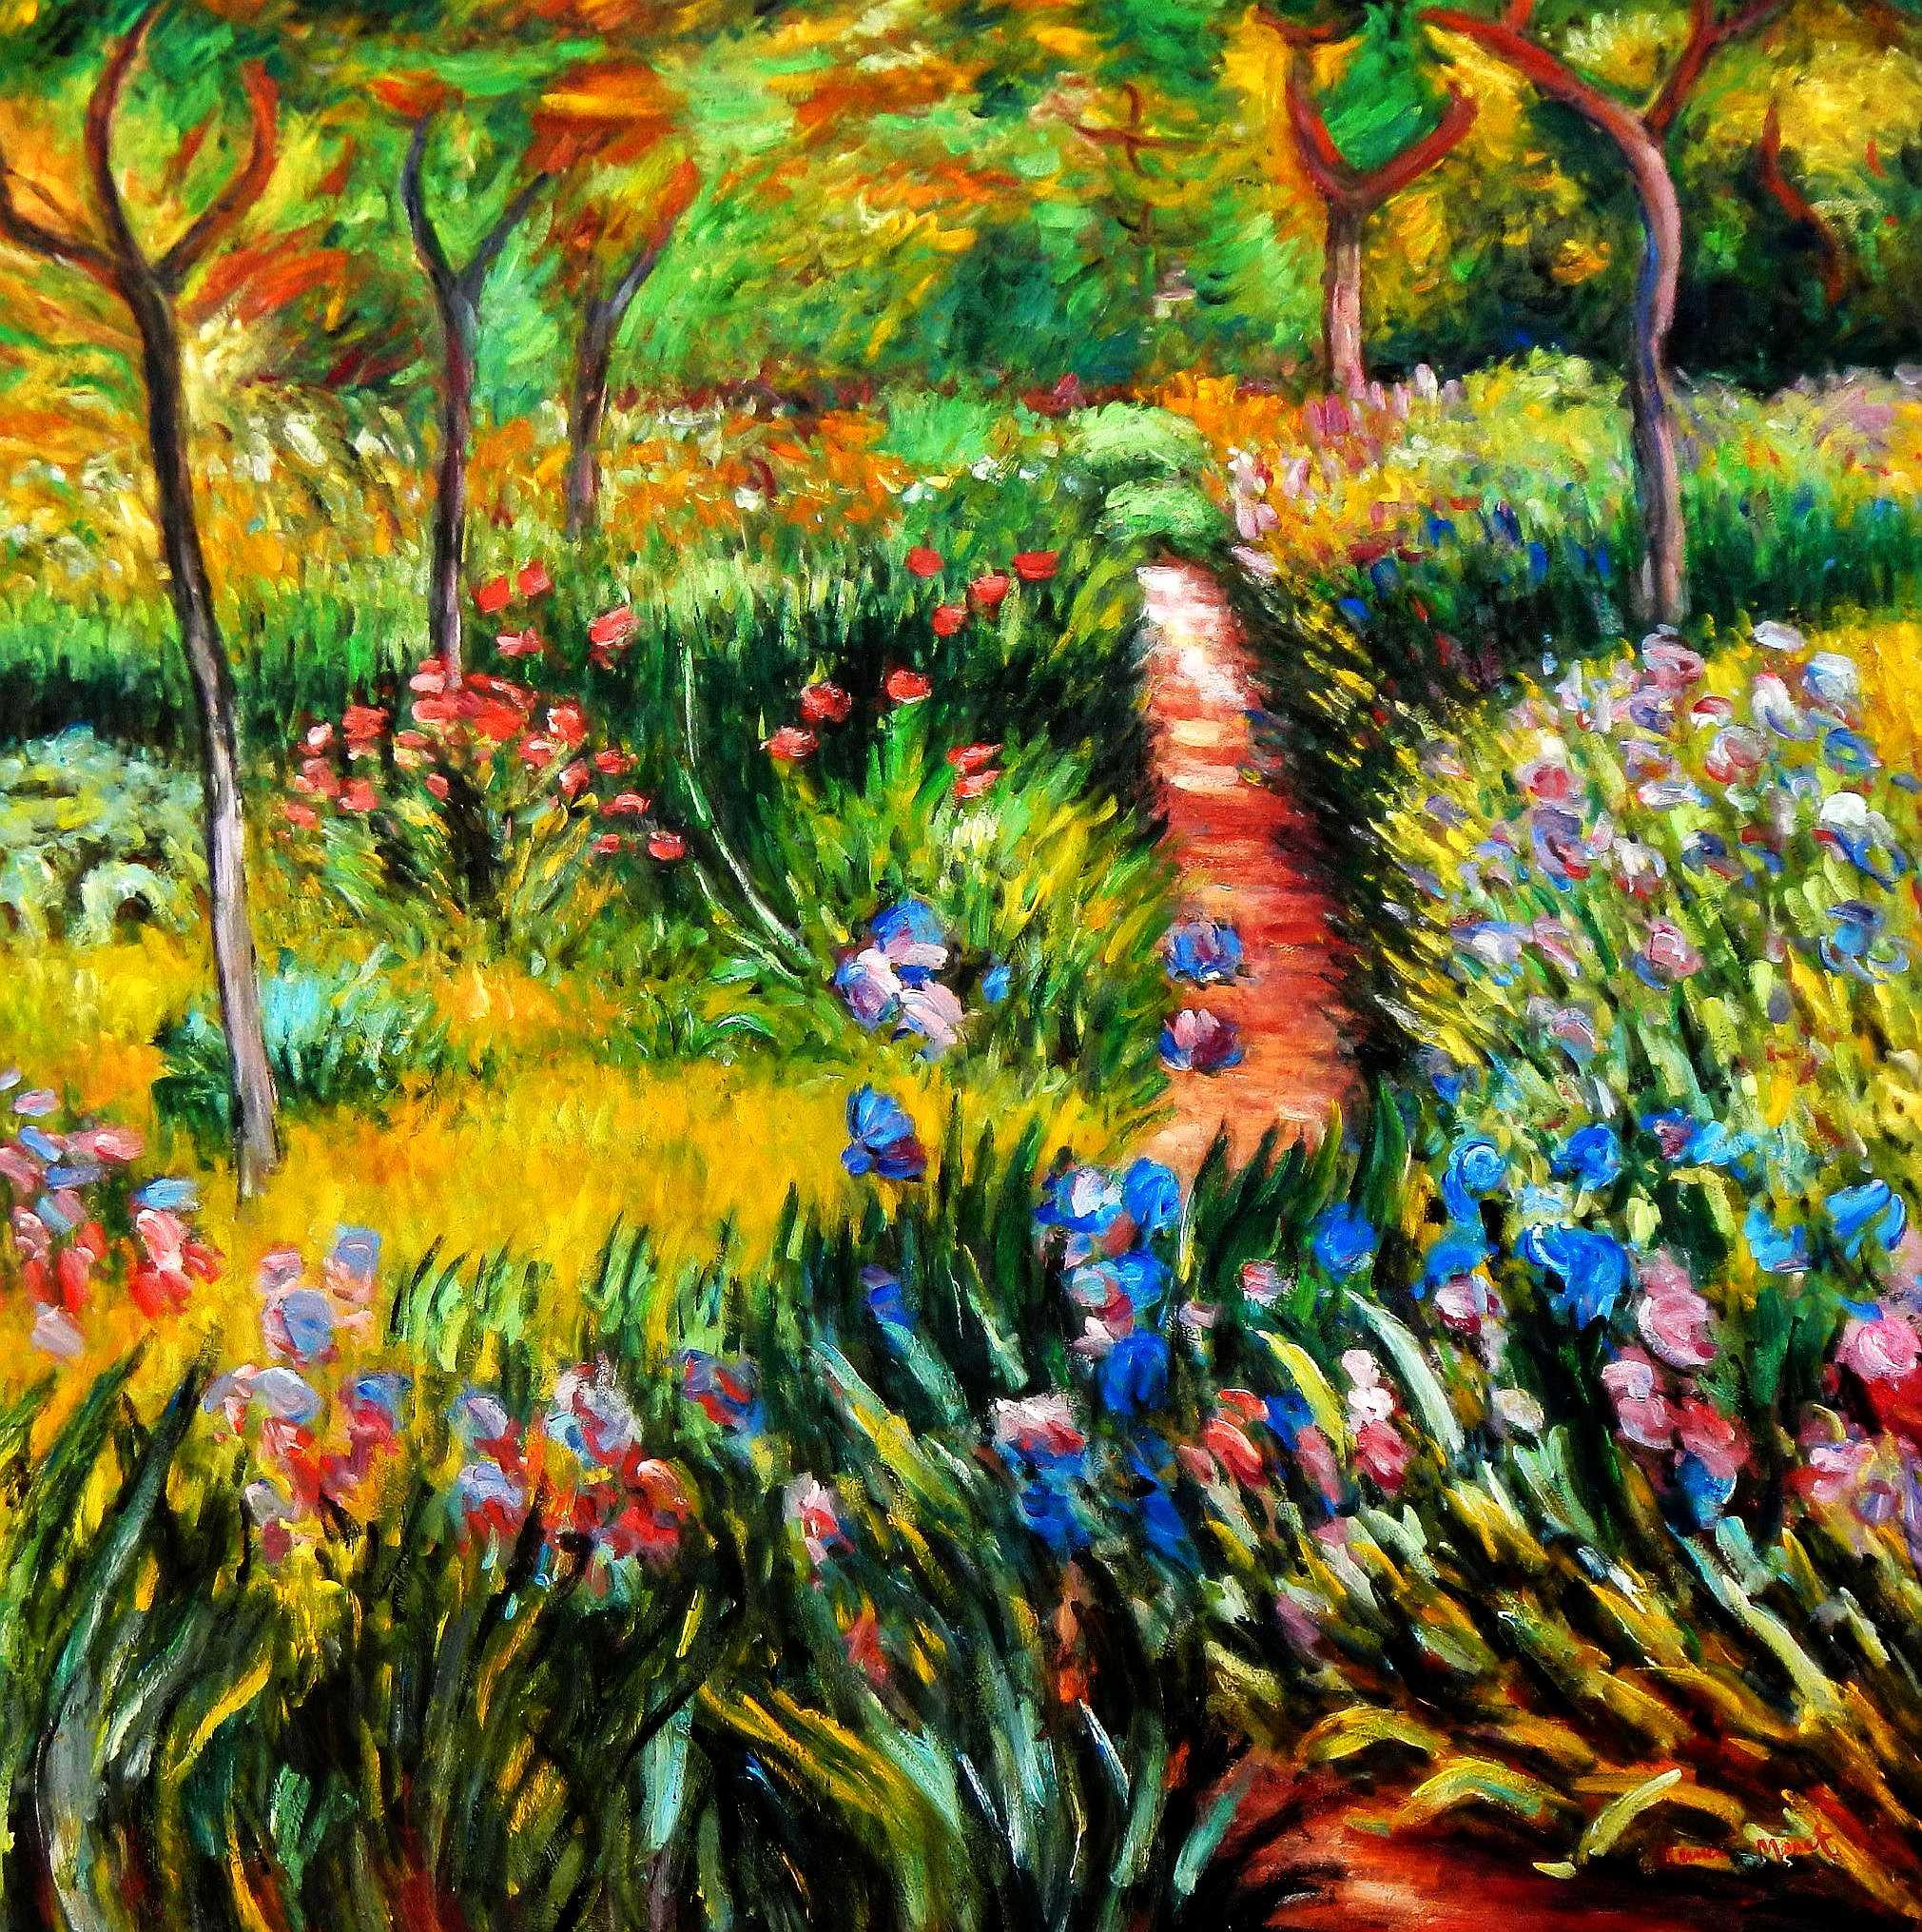 Claude Monet - Monet´s Garten in Giverny m95684 120x120cm exzellentes Ölgemälde